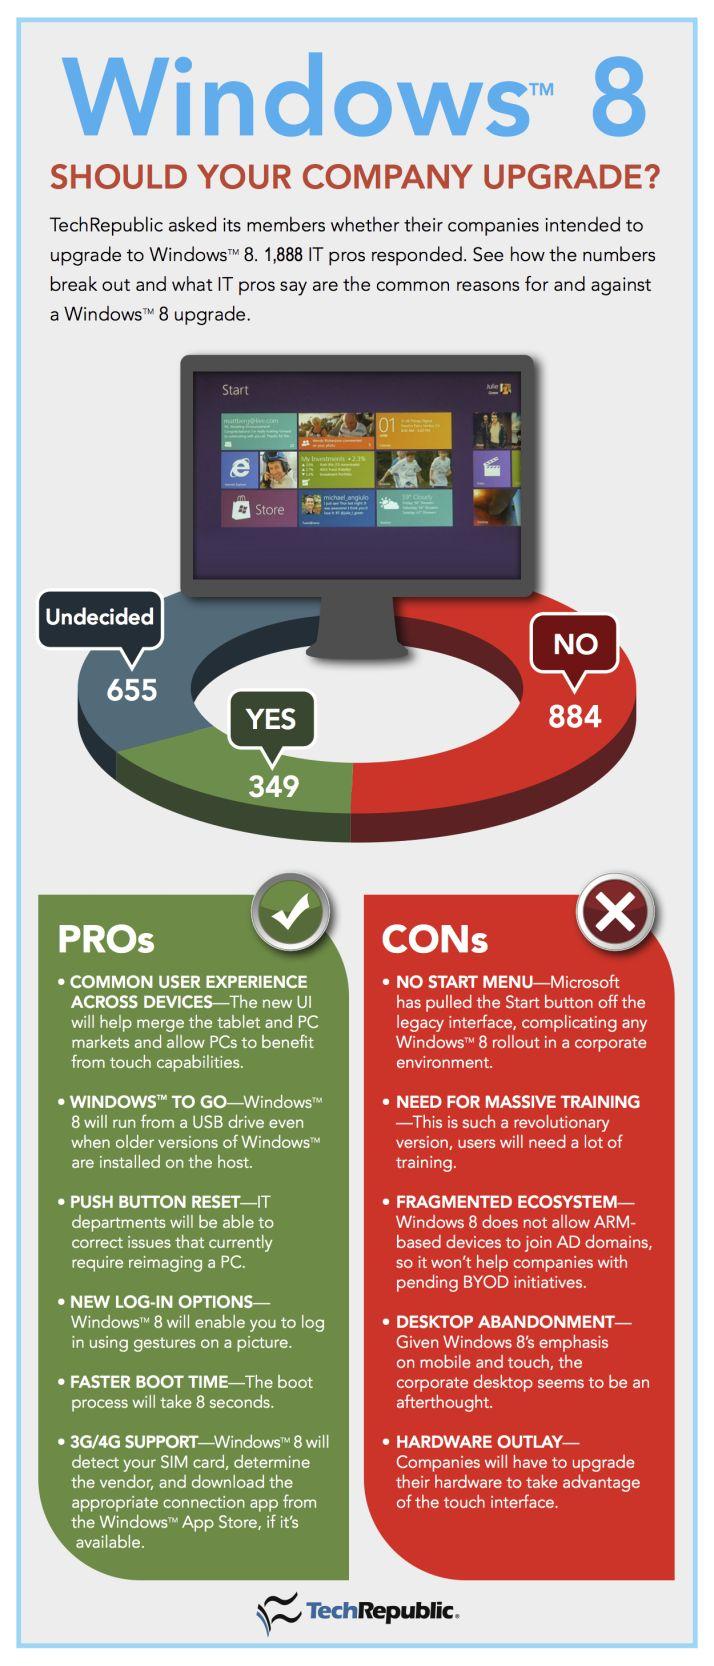 Windows 8 Should your company upgrade #infografia #infographic #microsoft